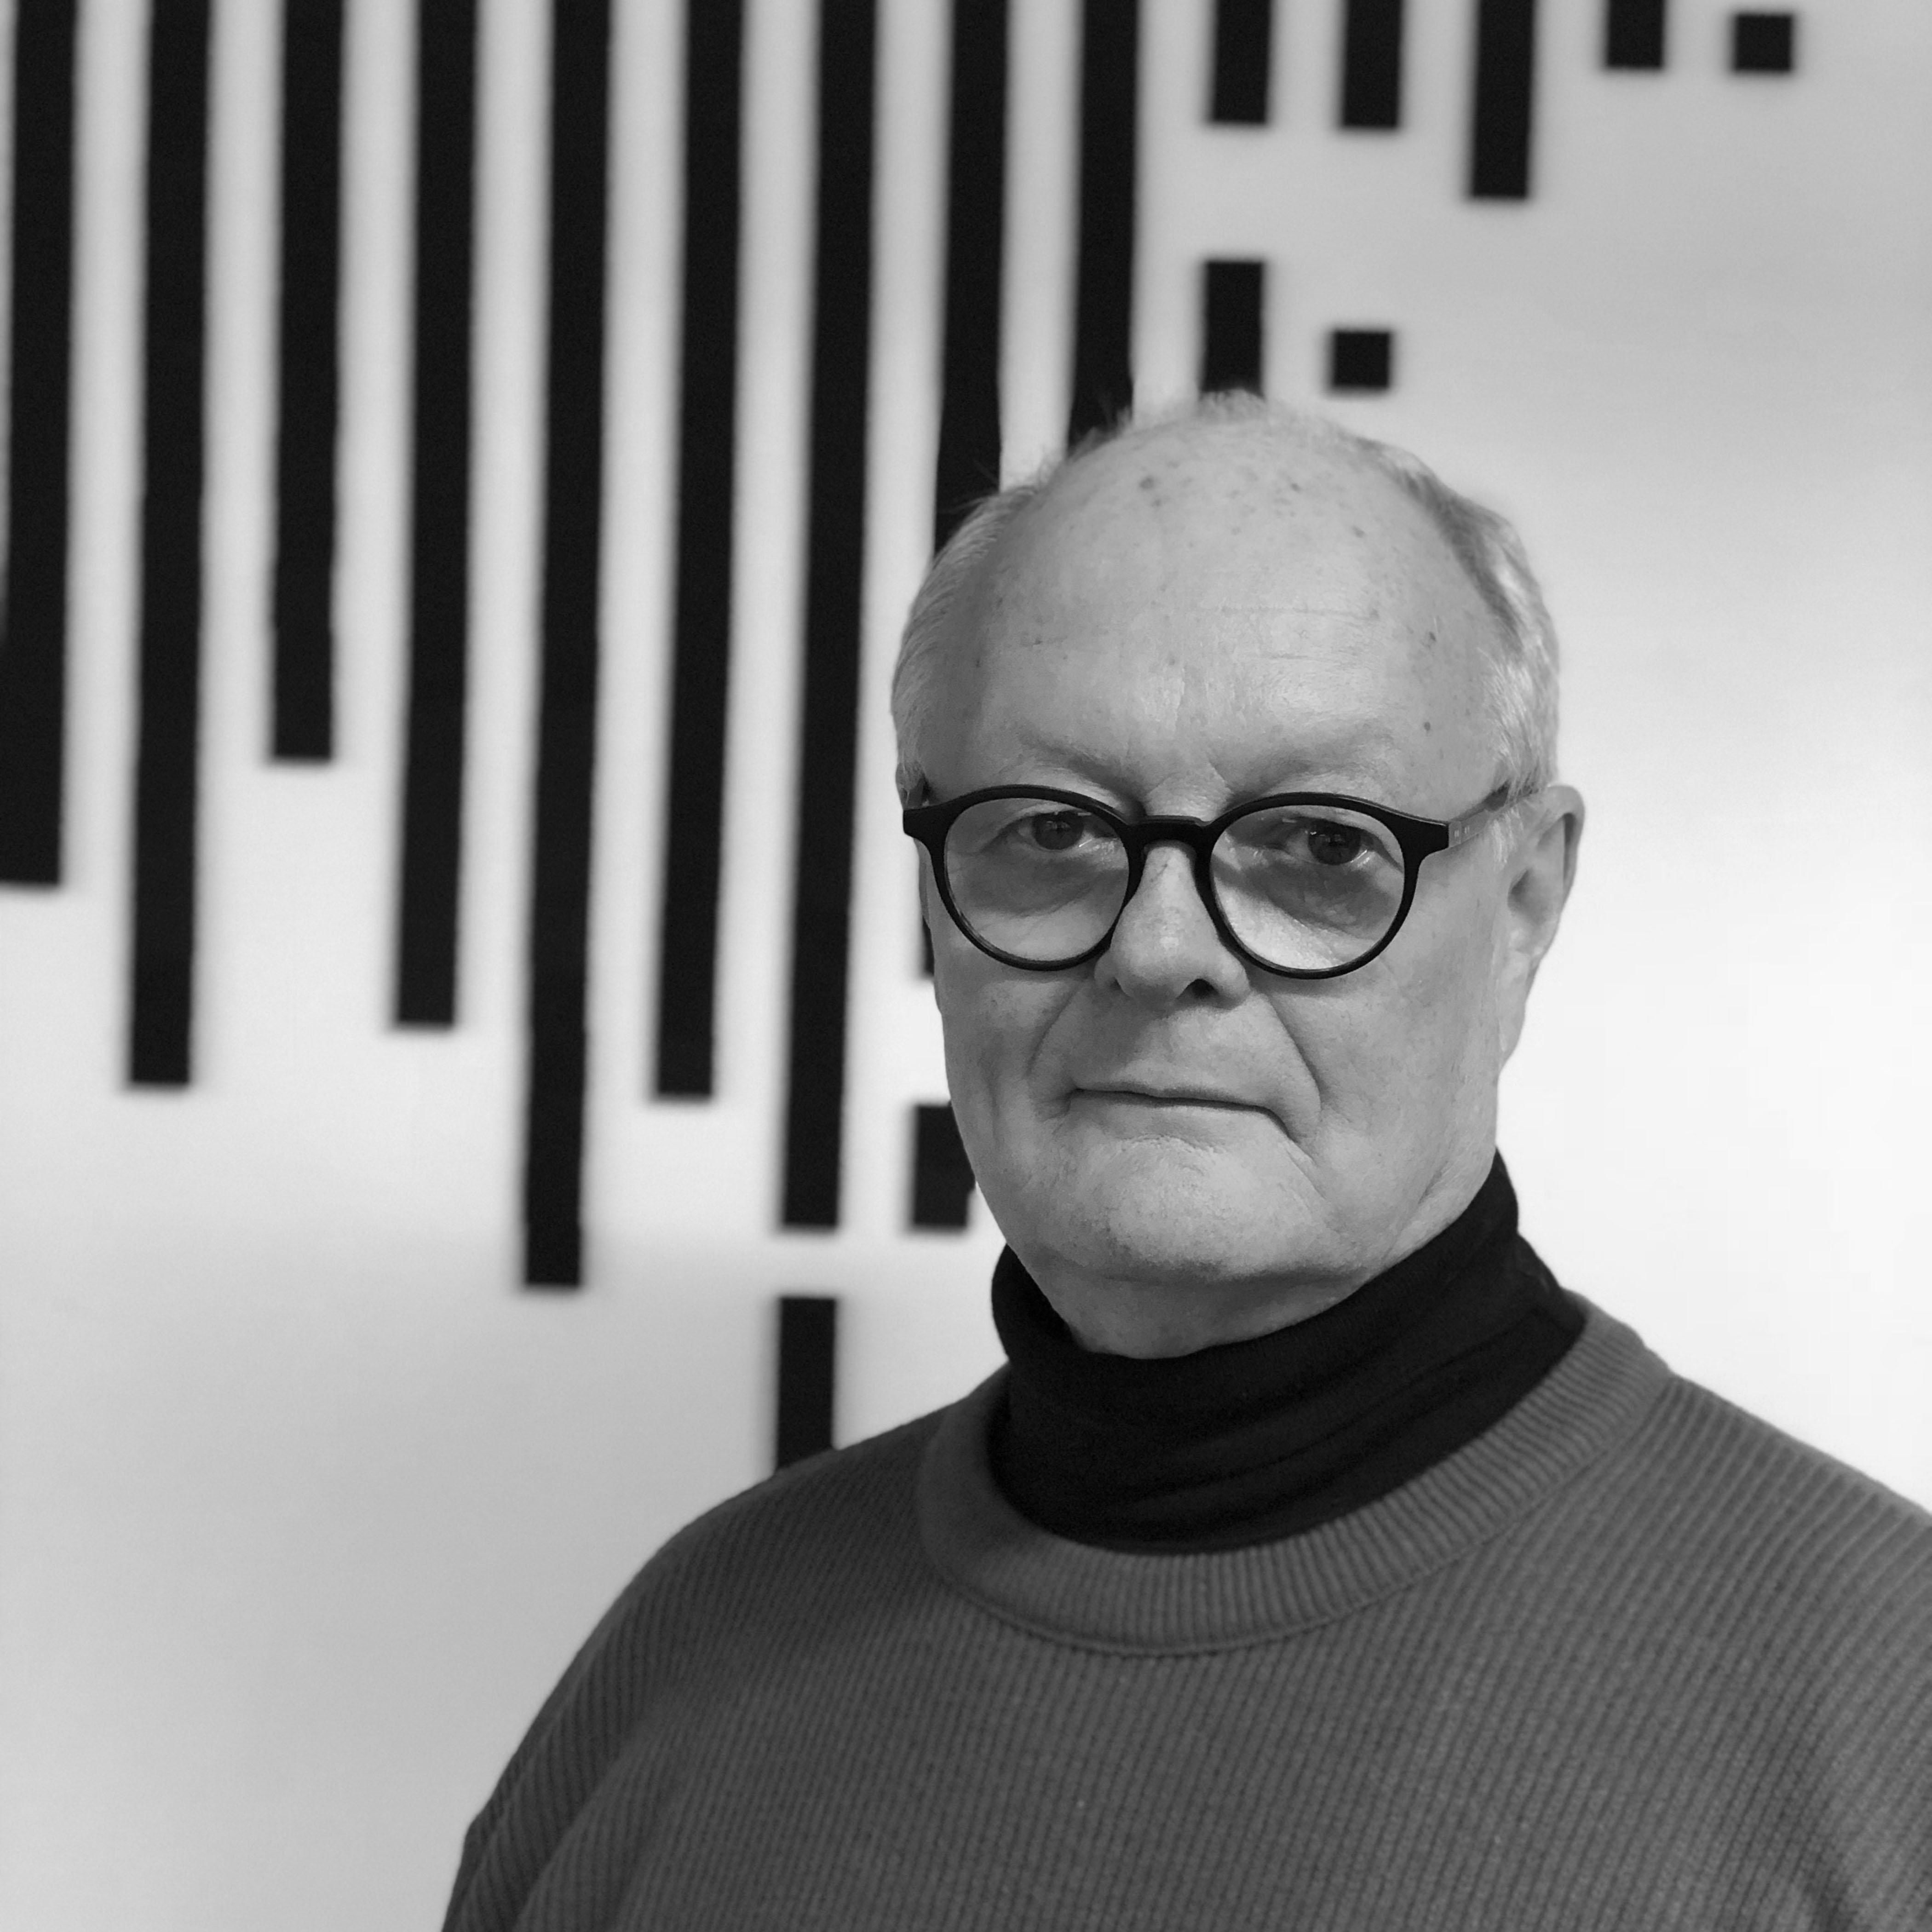 Jan Laustsen